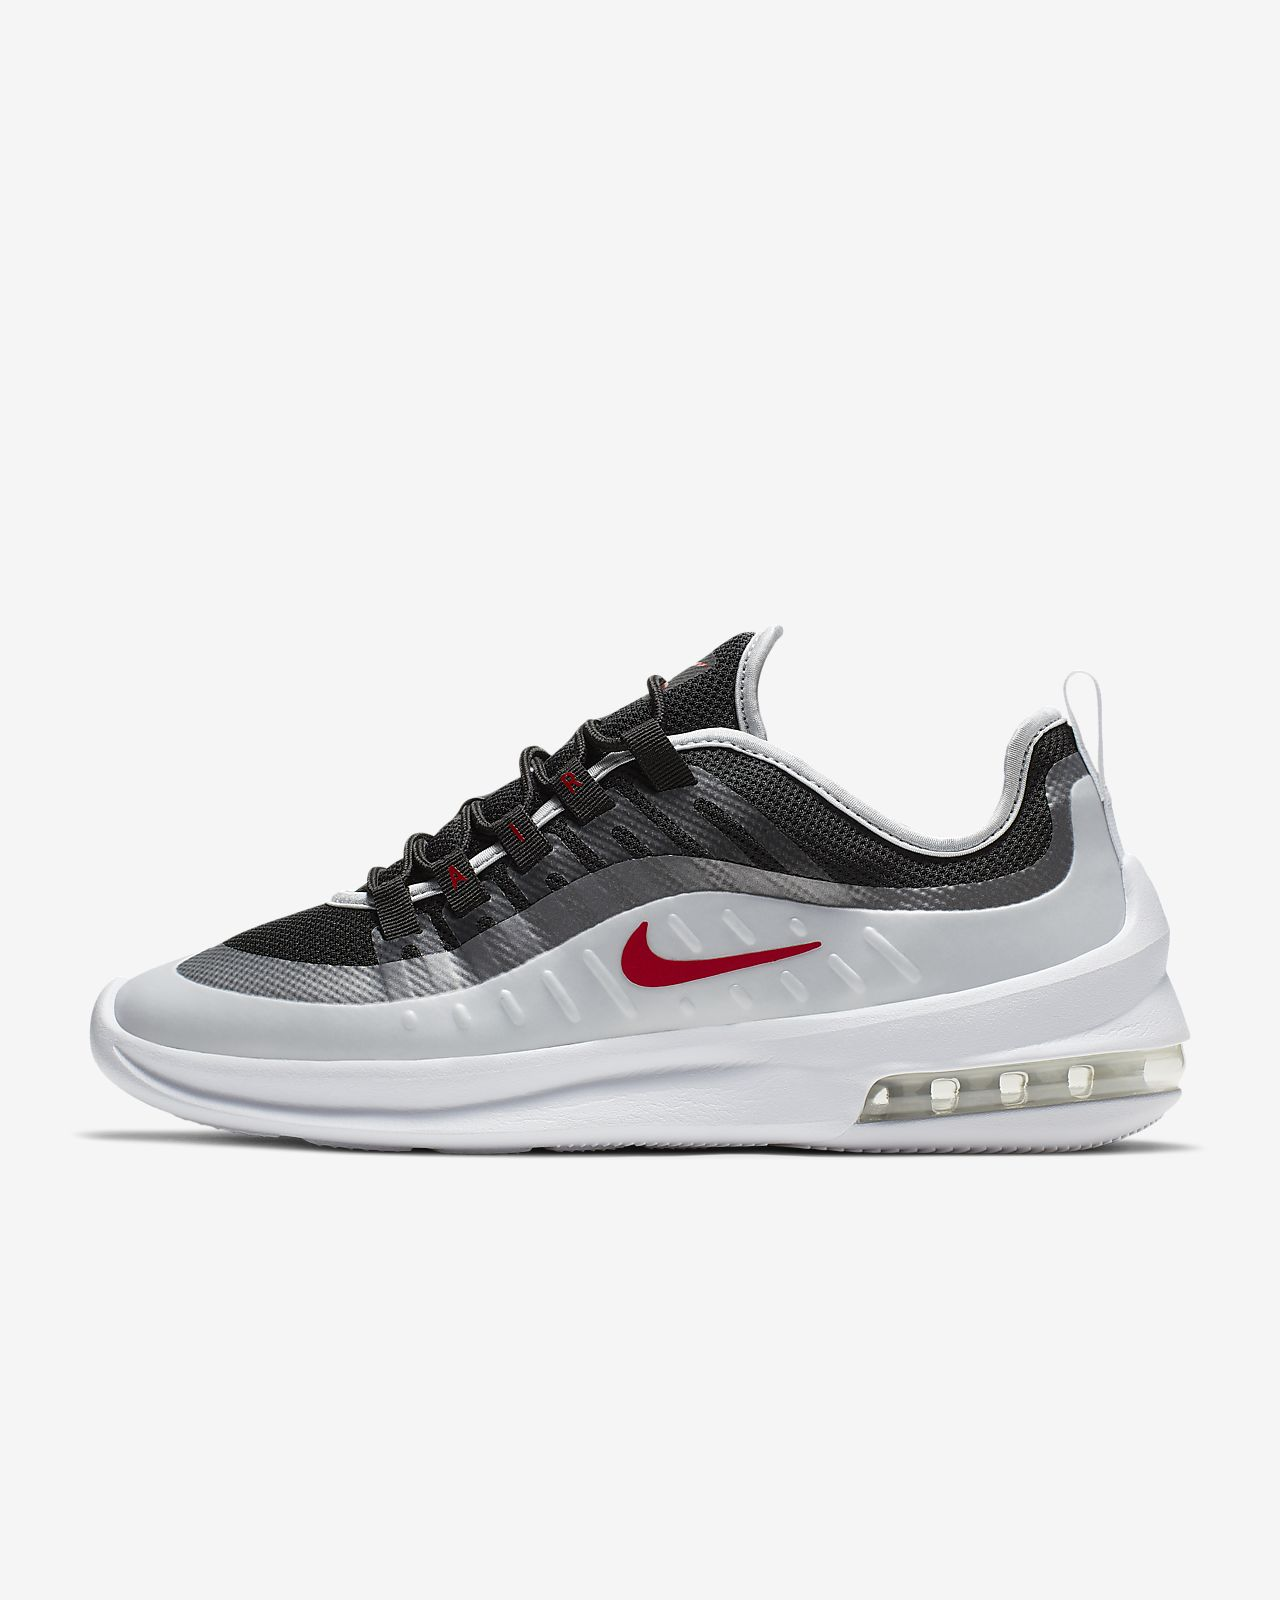 Nike Air Max Axis Men's Shoe